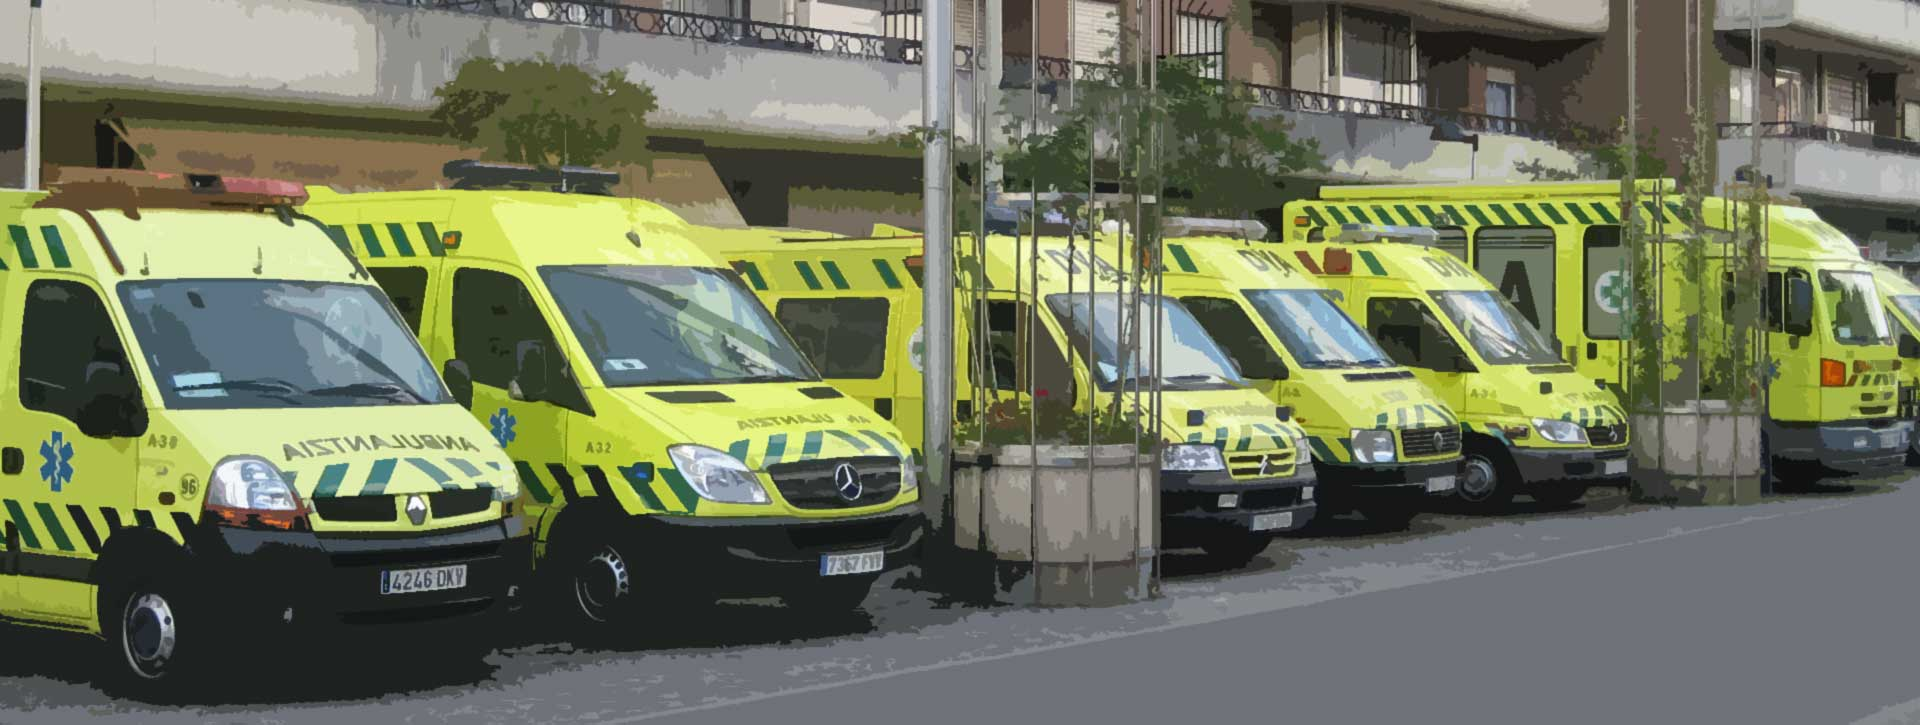 http://dsbroker.es/wp-content/uploads/2017/07/slider-ambulancias-2.jpg